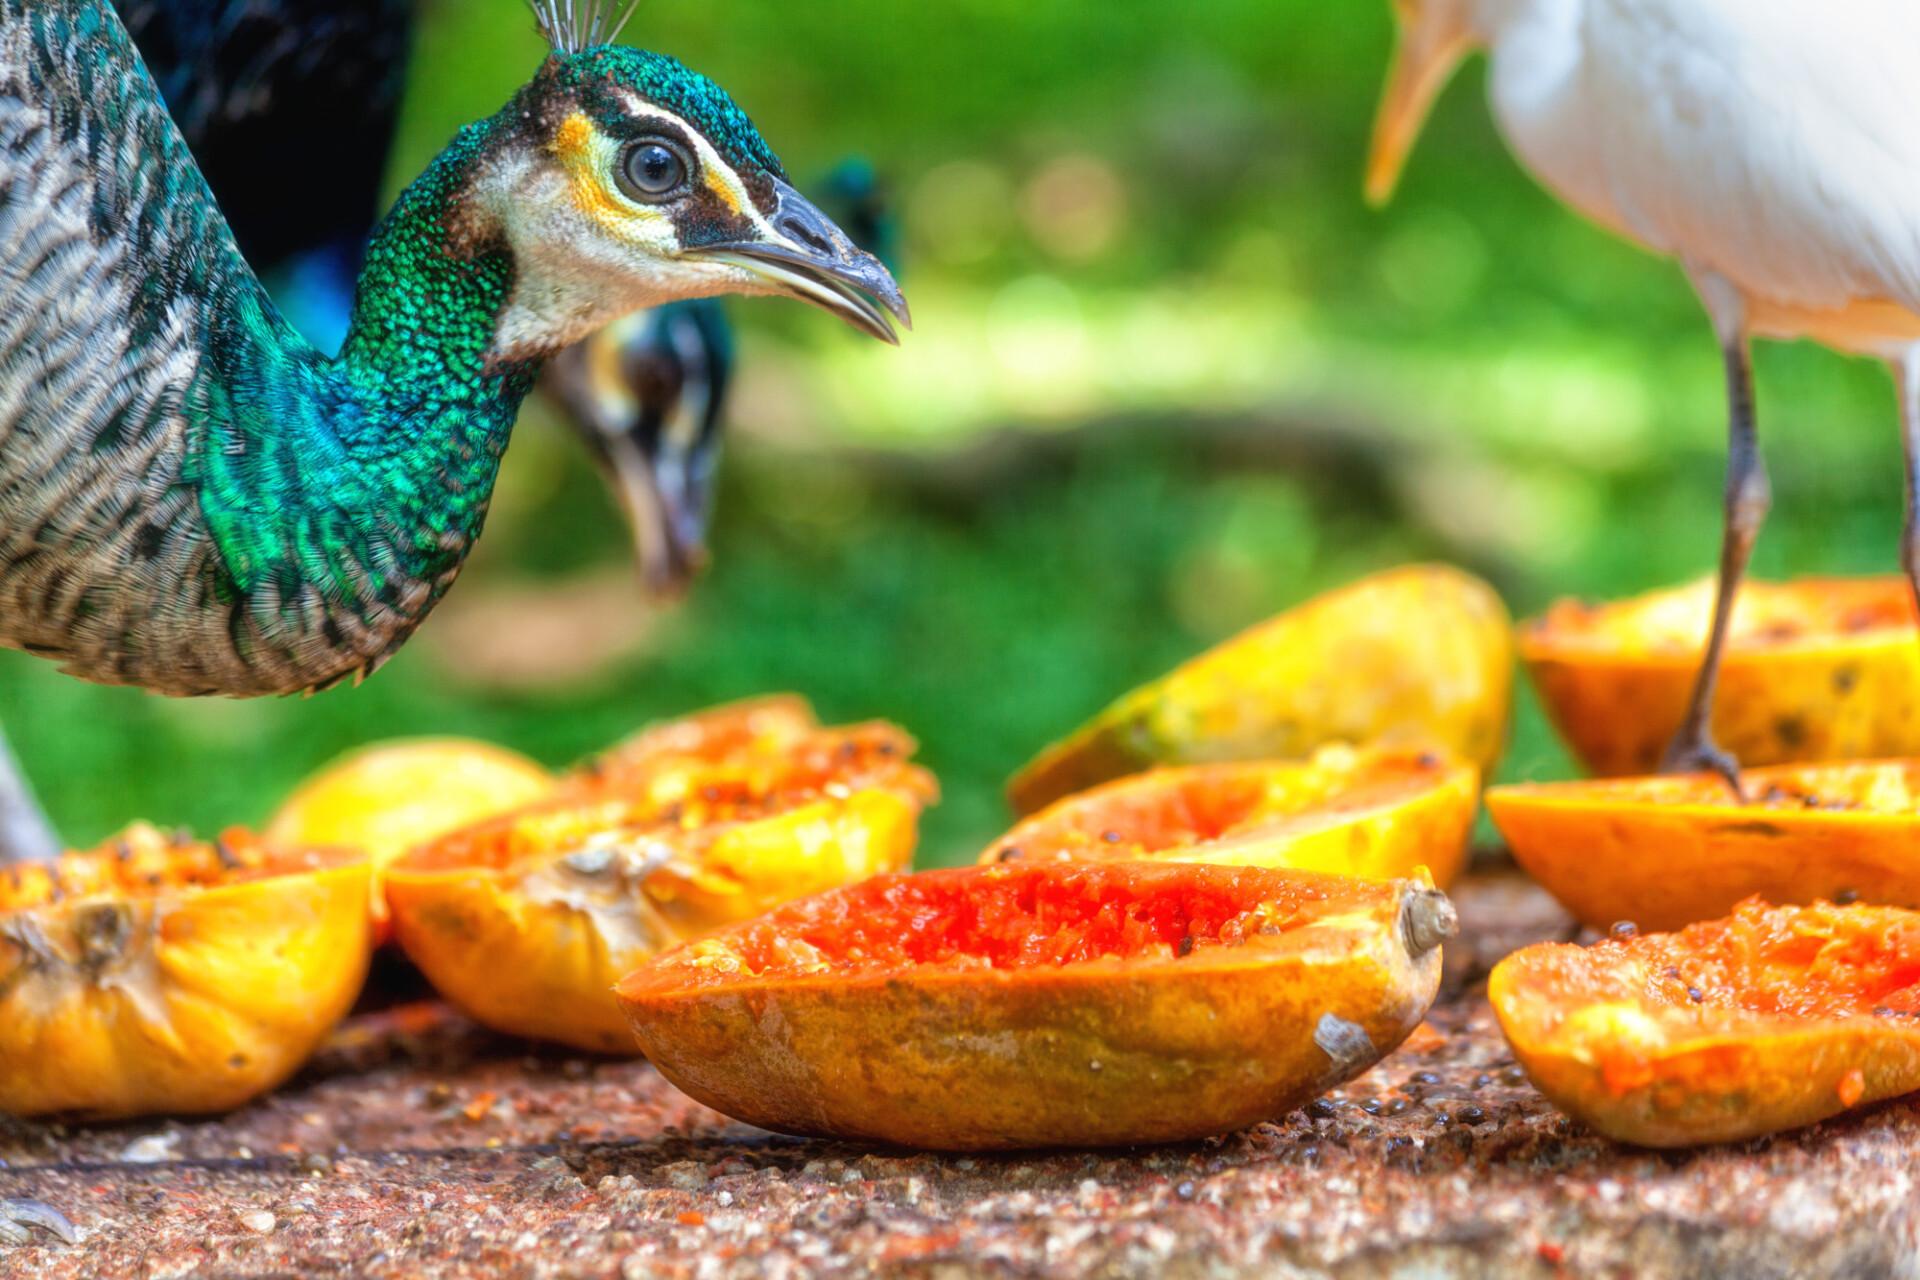 peacock eating fruits